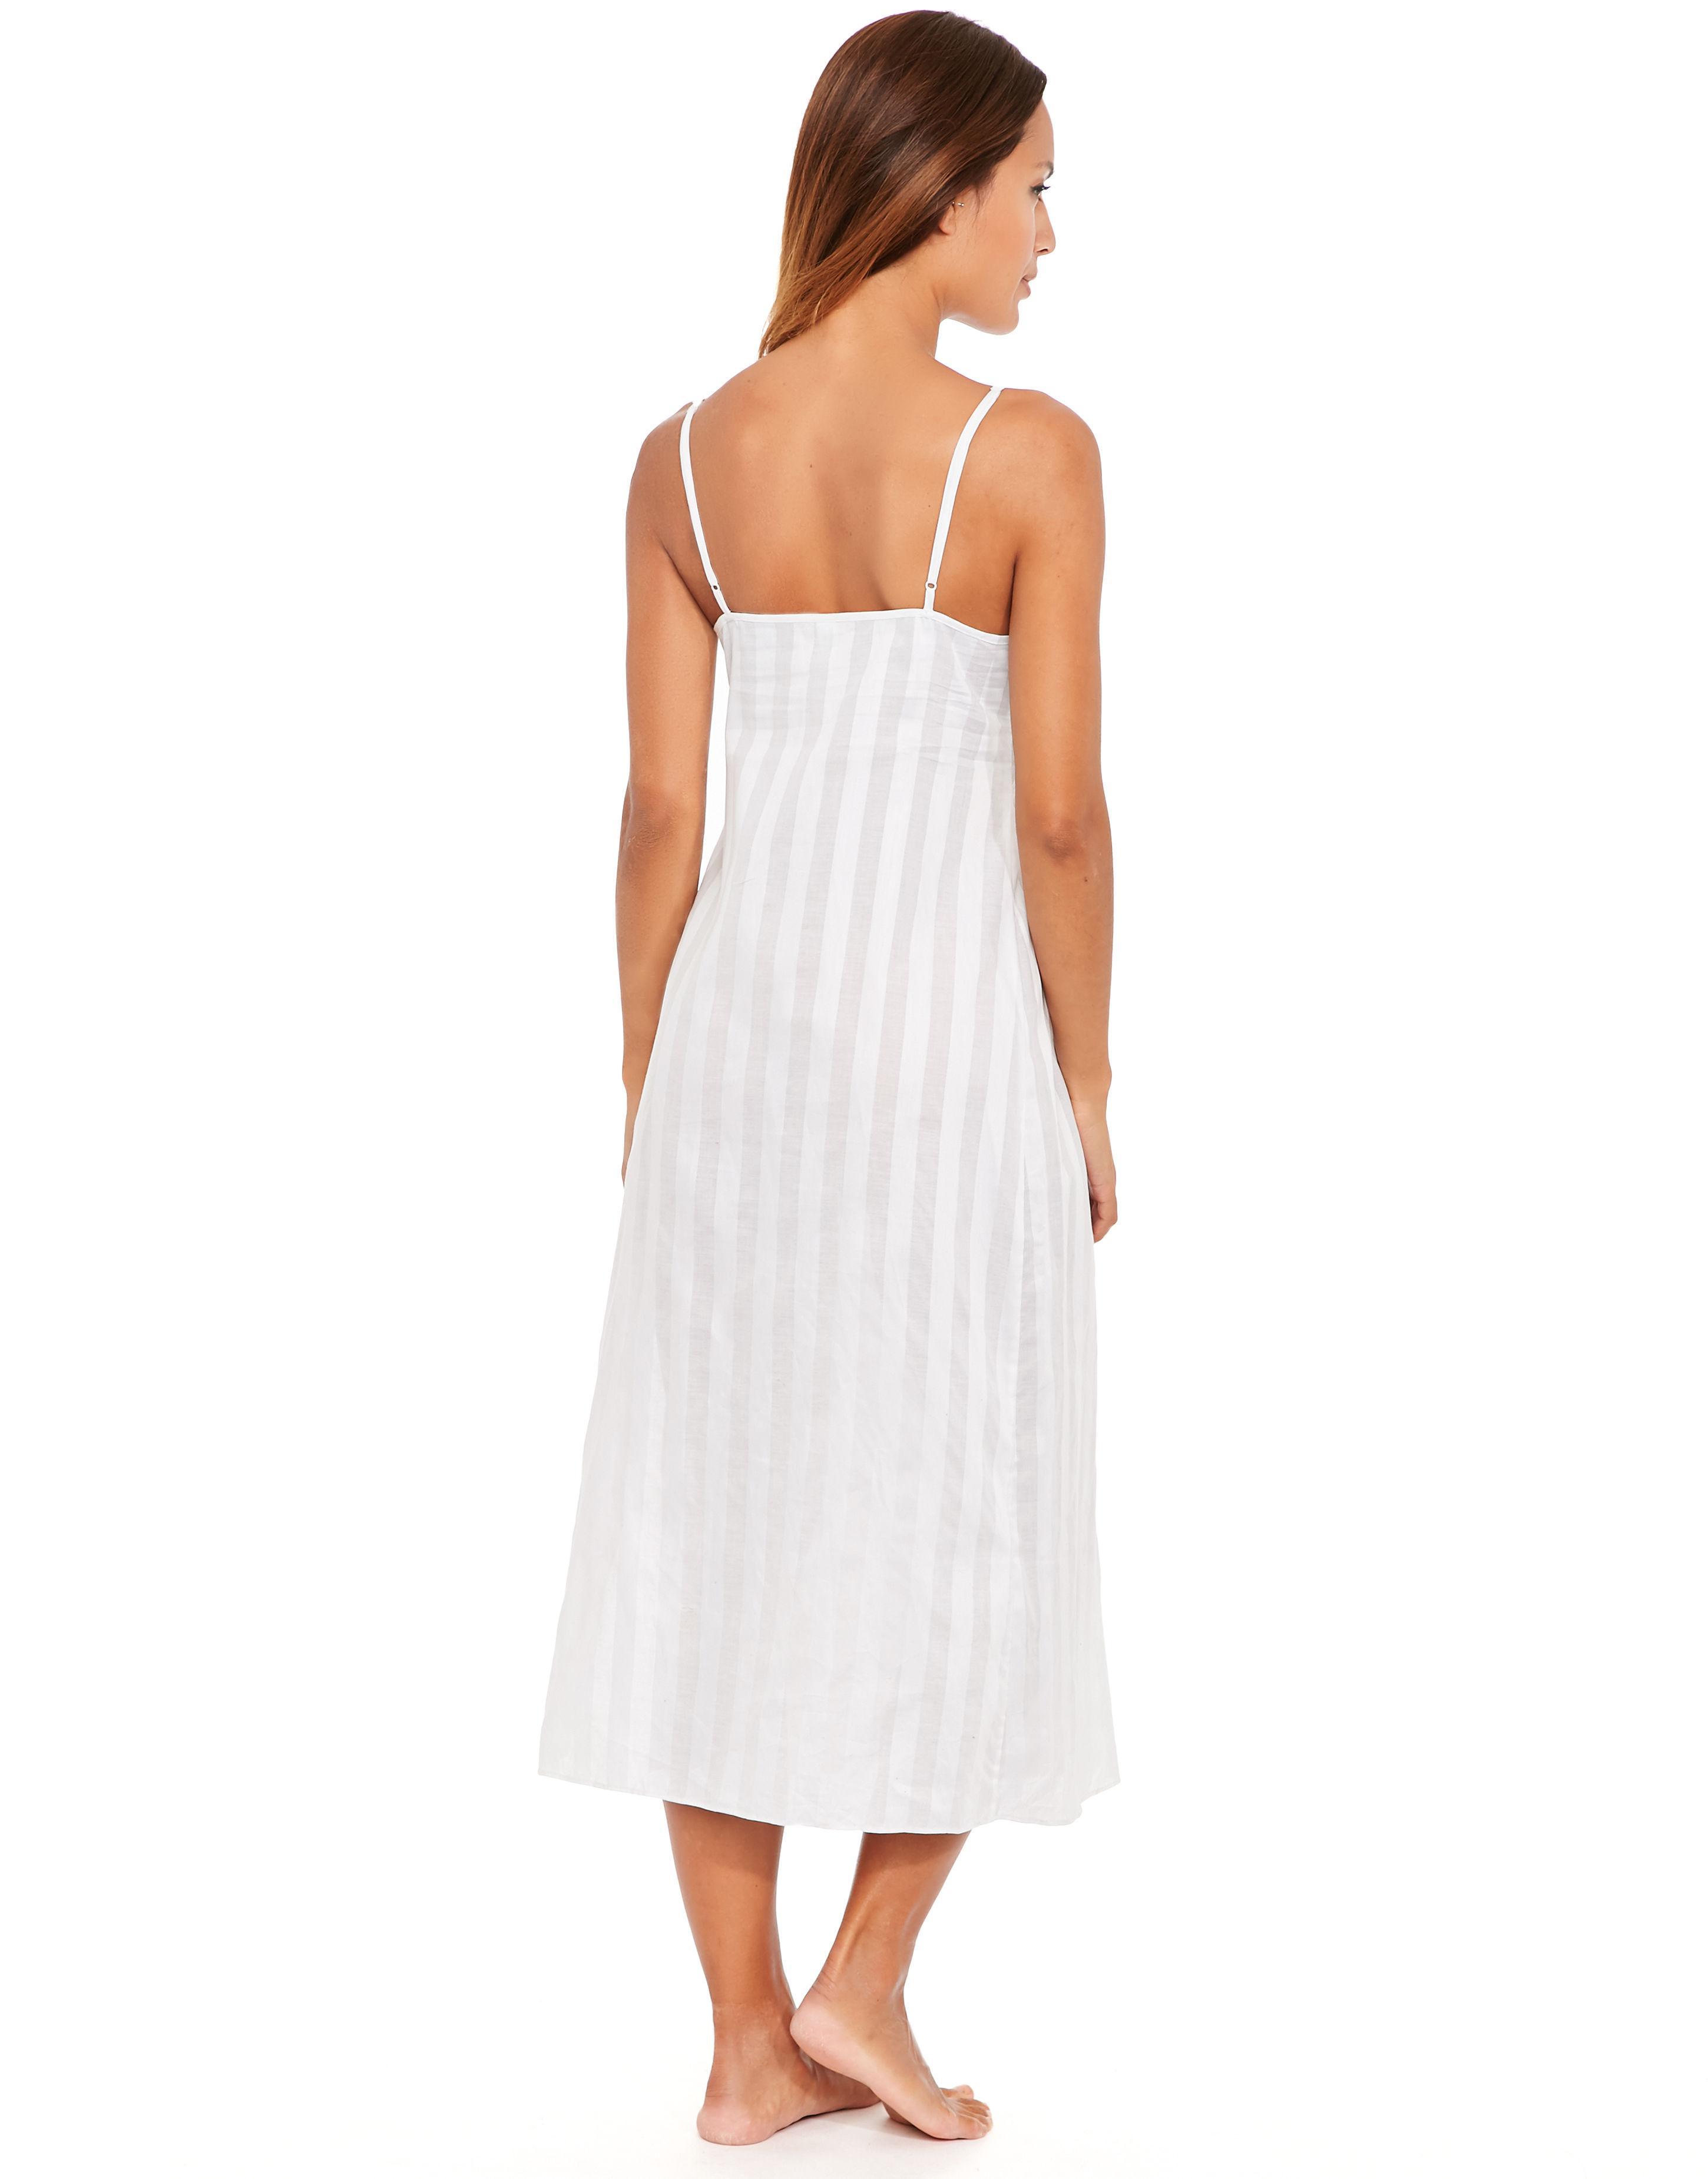 Bodas Cotton Nightwear Long Chemise in White - Lyst 64a8f2102